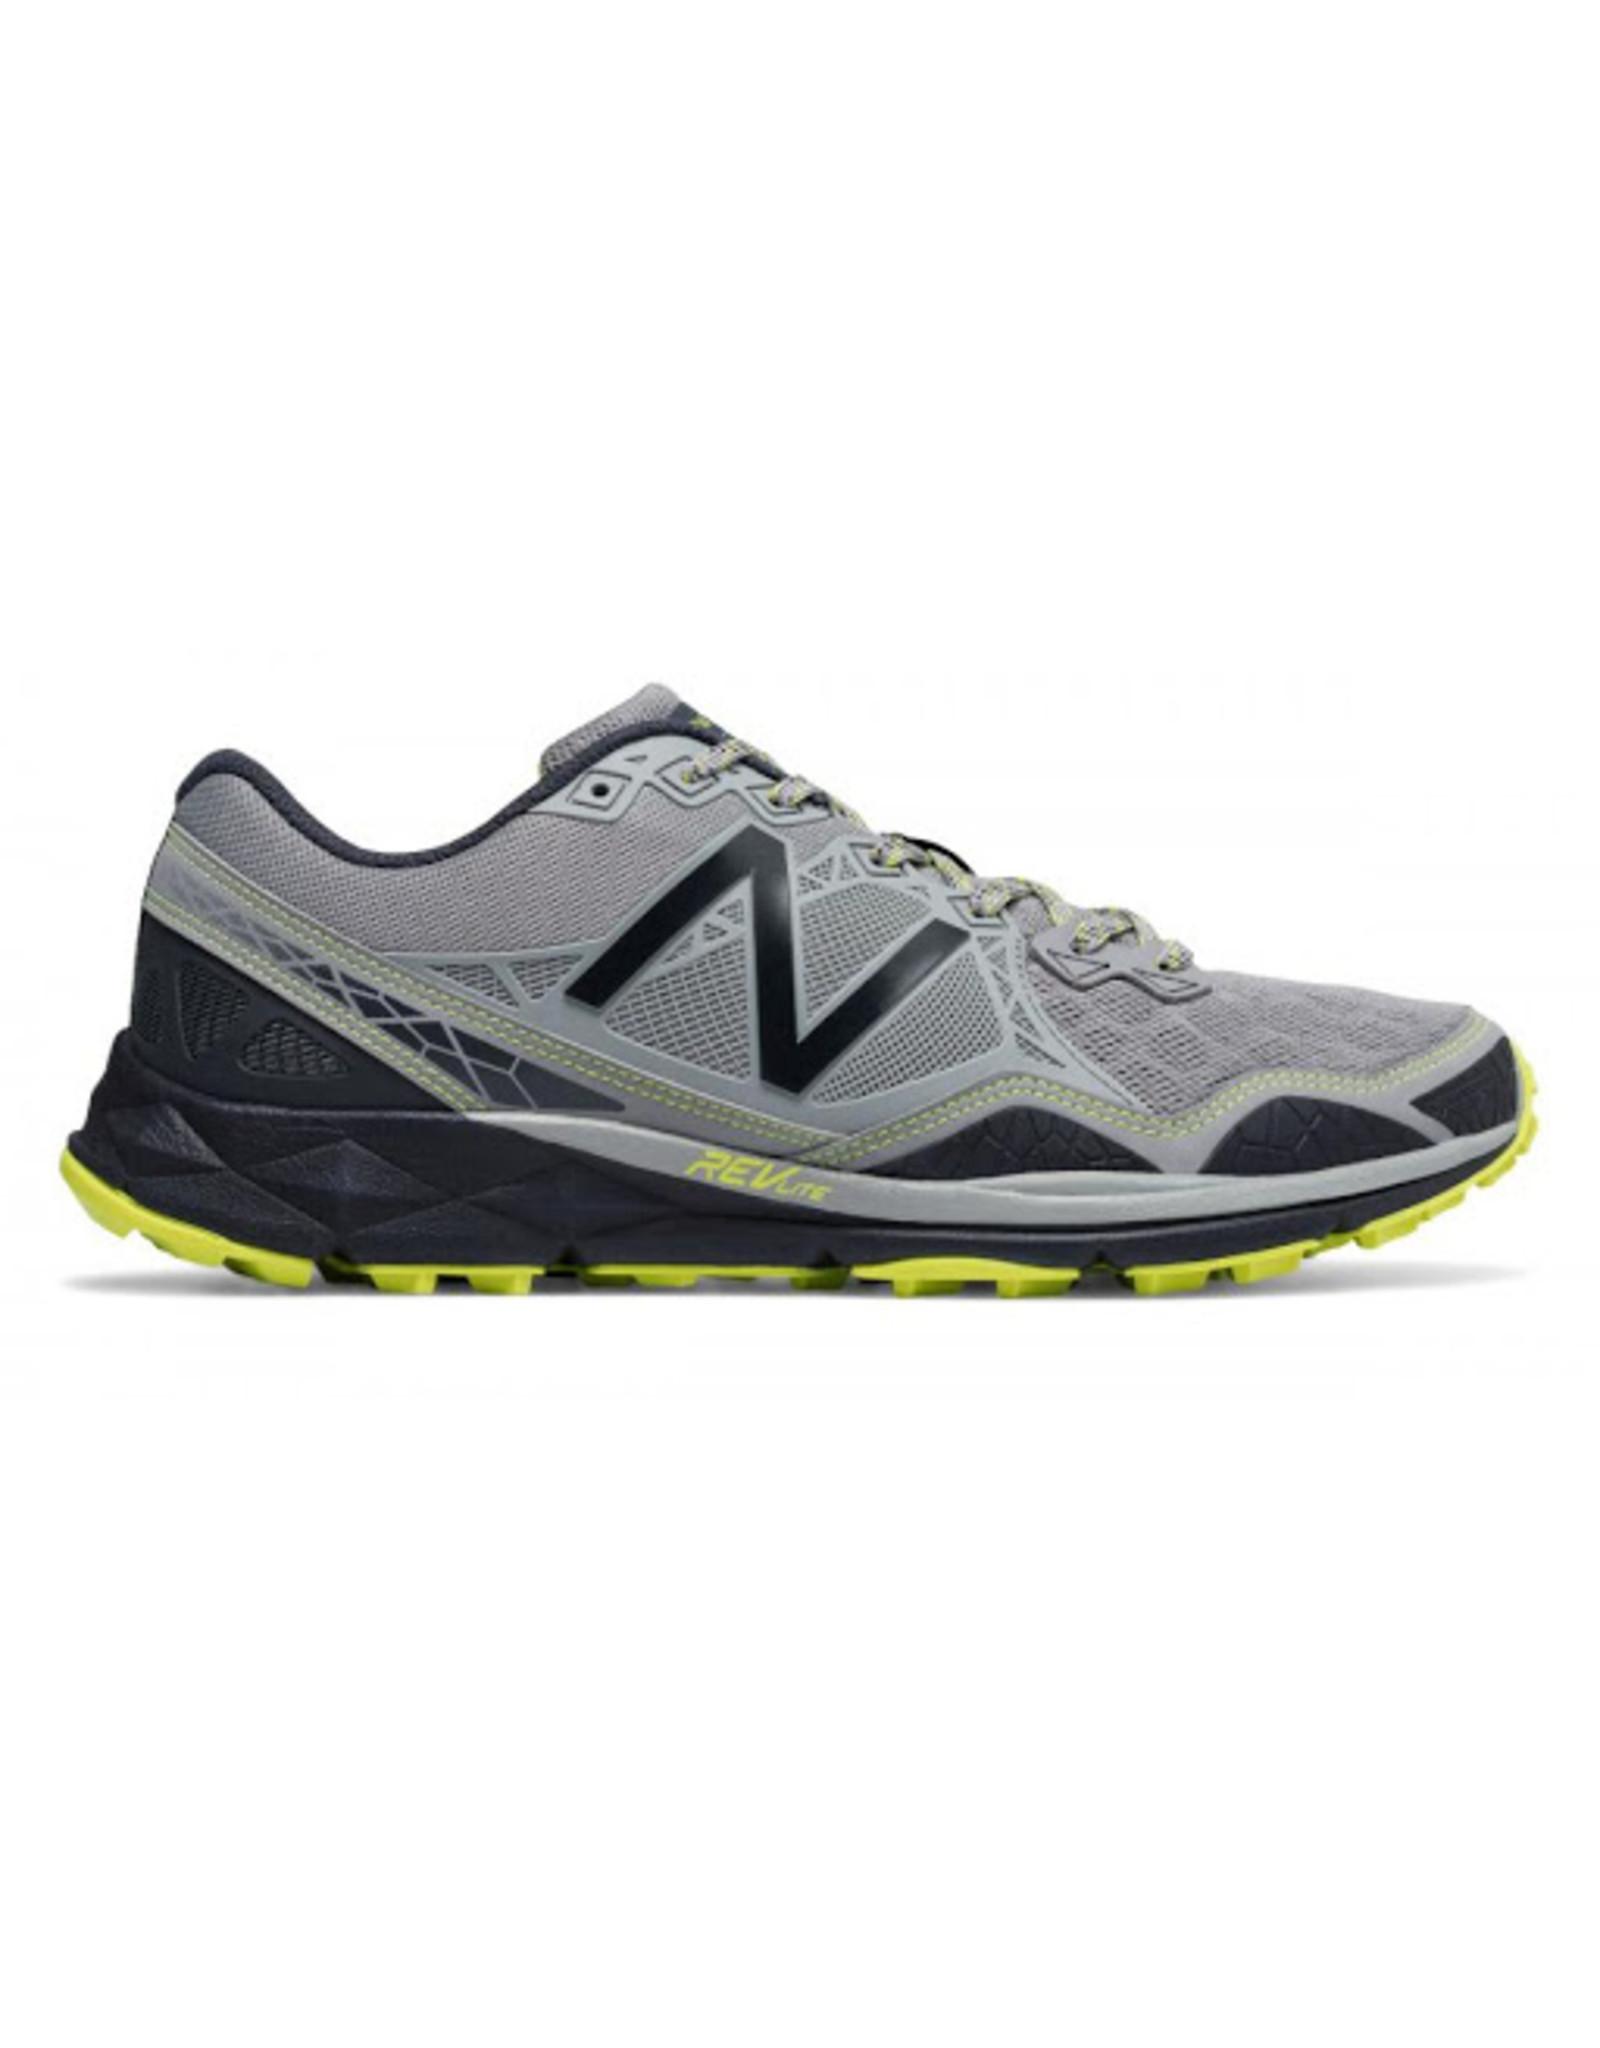 New Balance New Balance - M's - 910GY3 -